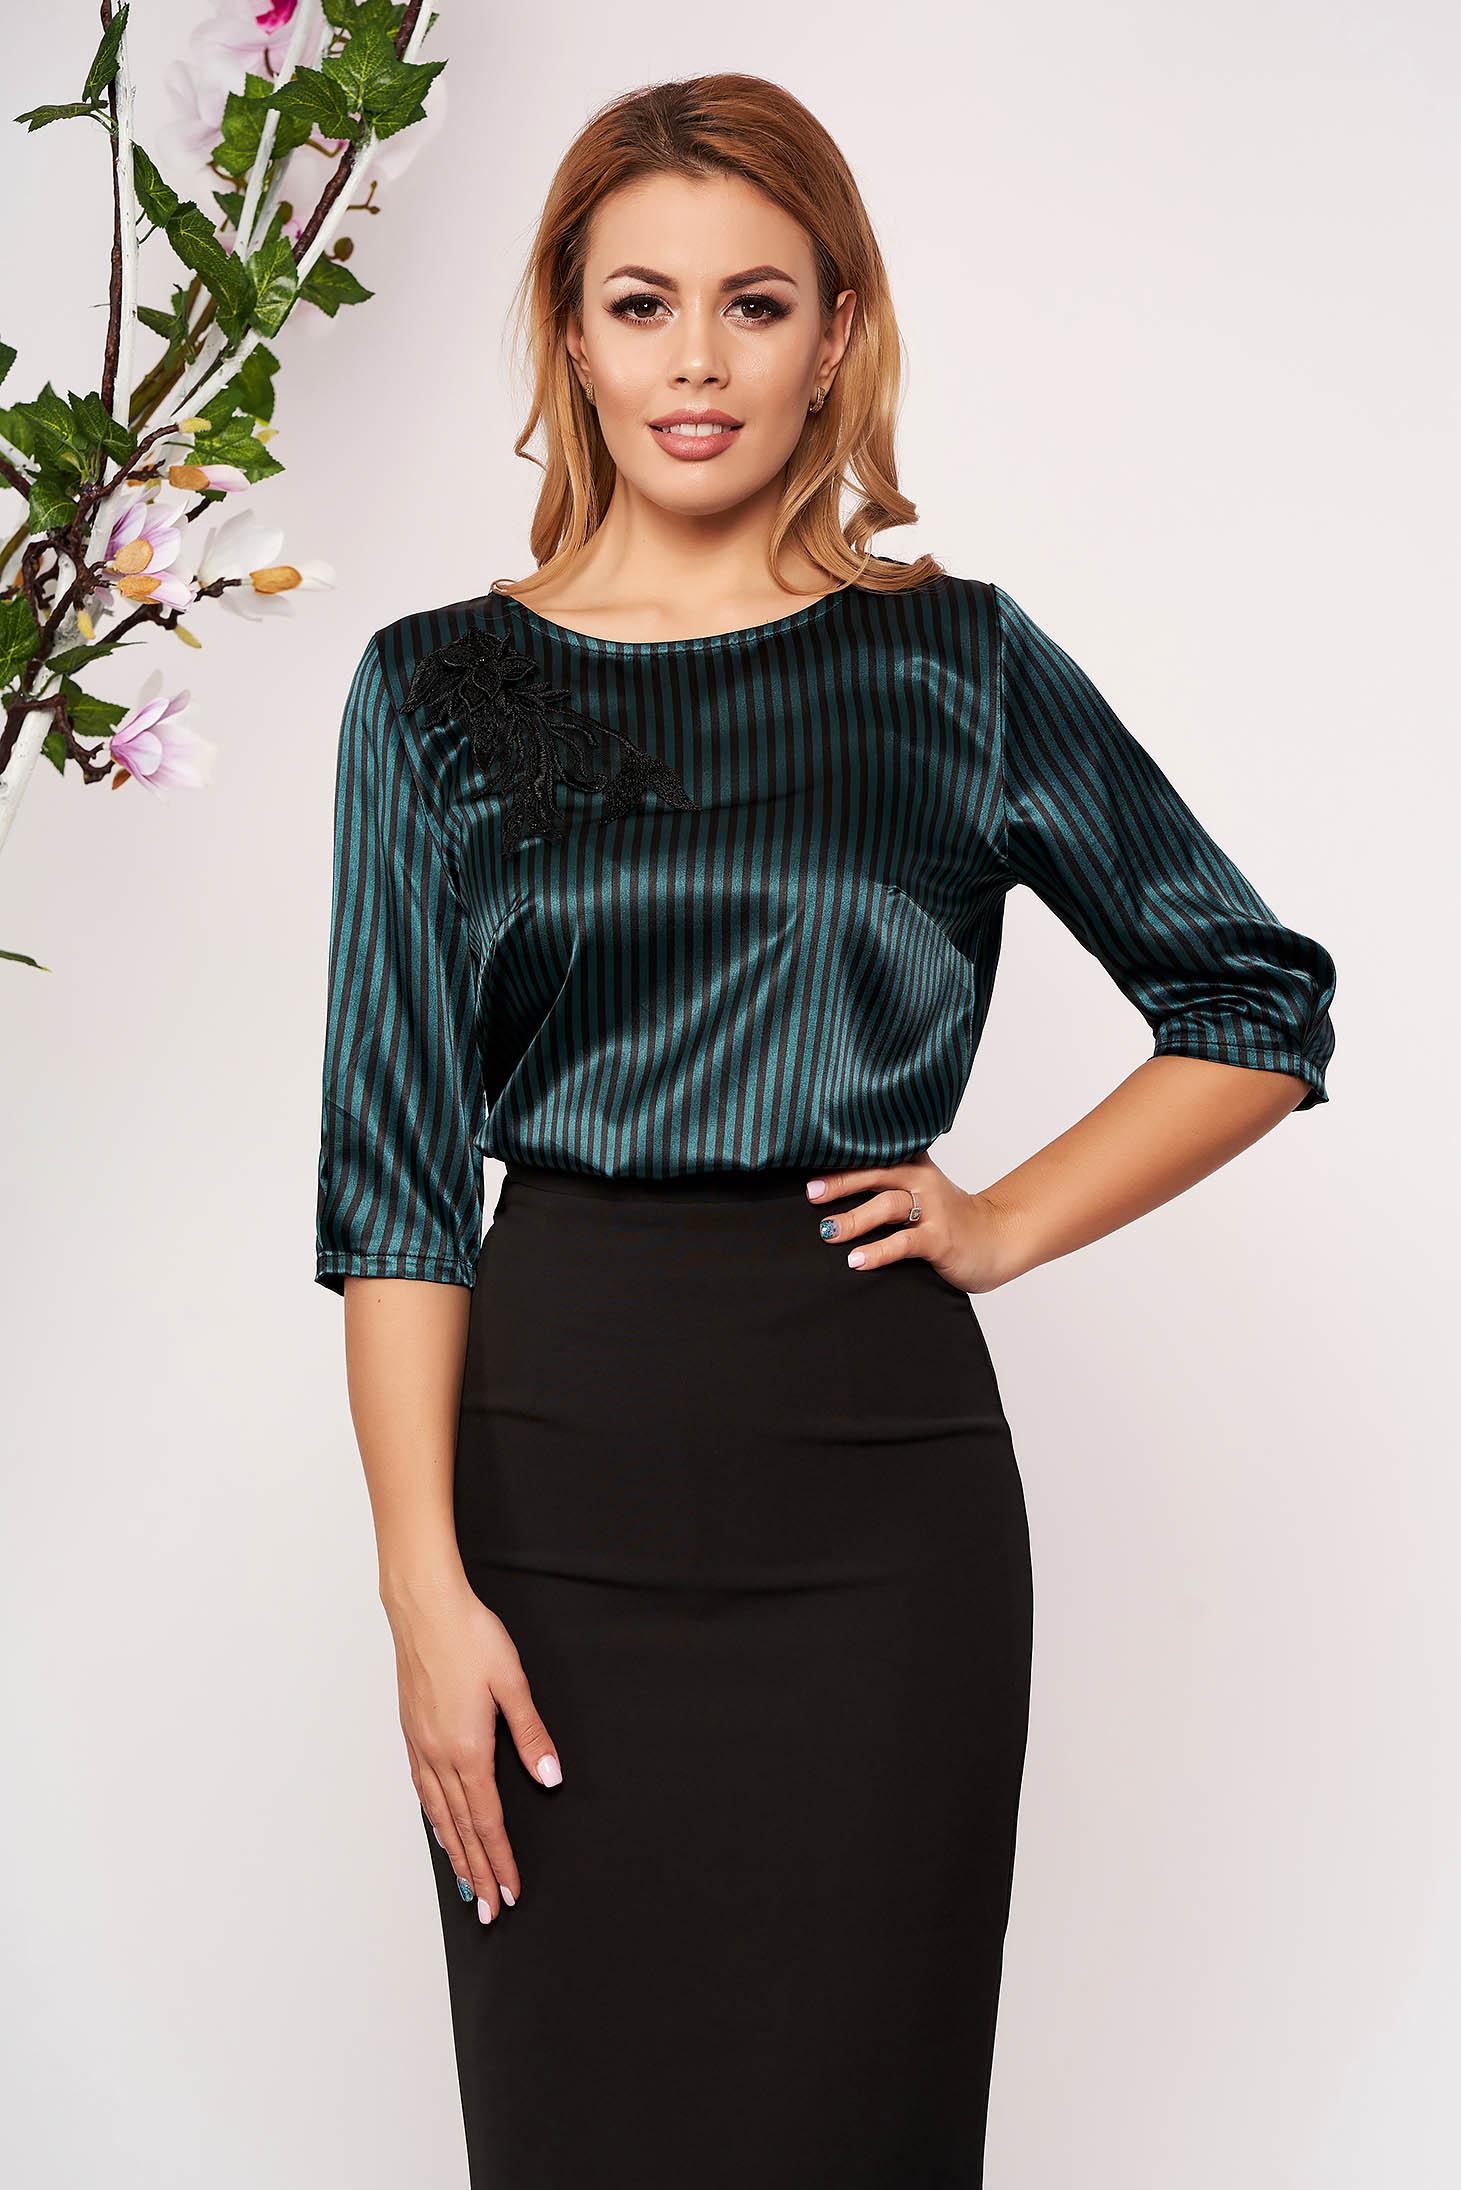 Bluza dama StarShinerS verde scurta eleganta din satin cu croi larg si dungi cu broderie florala